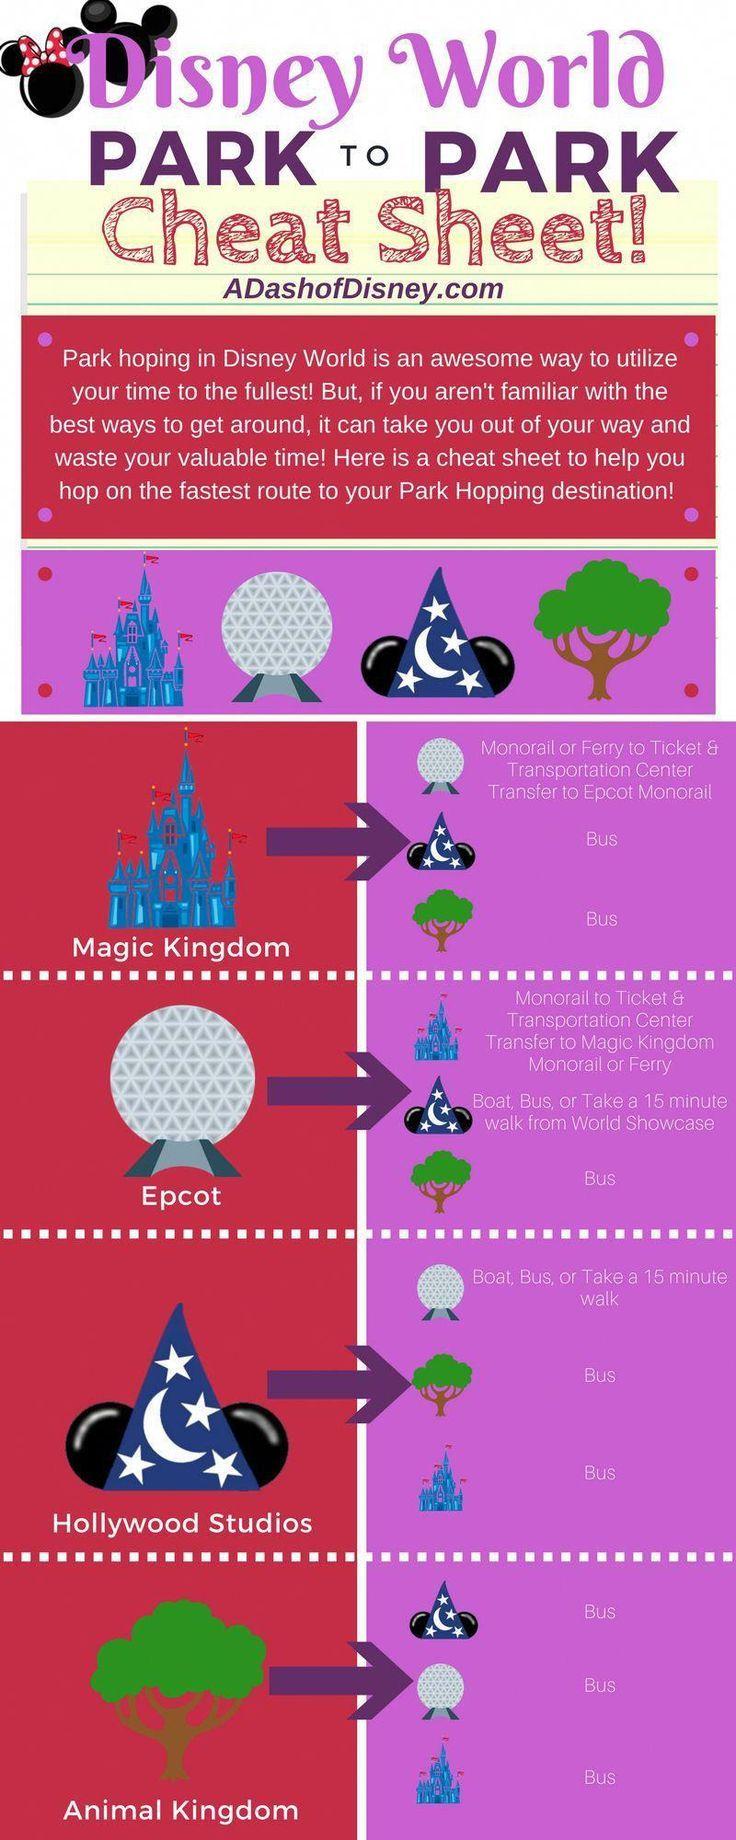 How To Get A Das Pass At Disney World